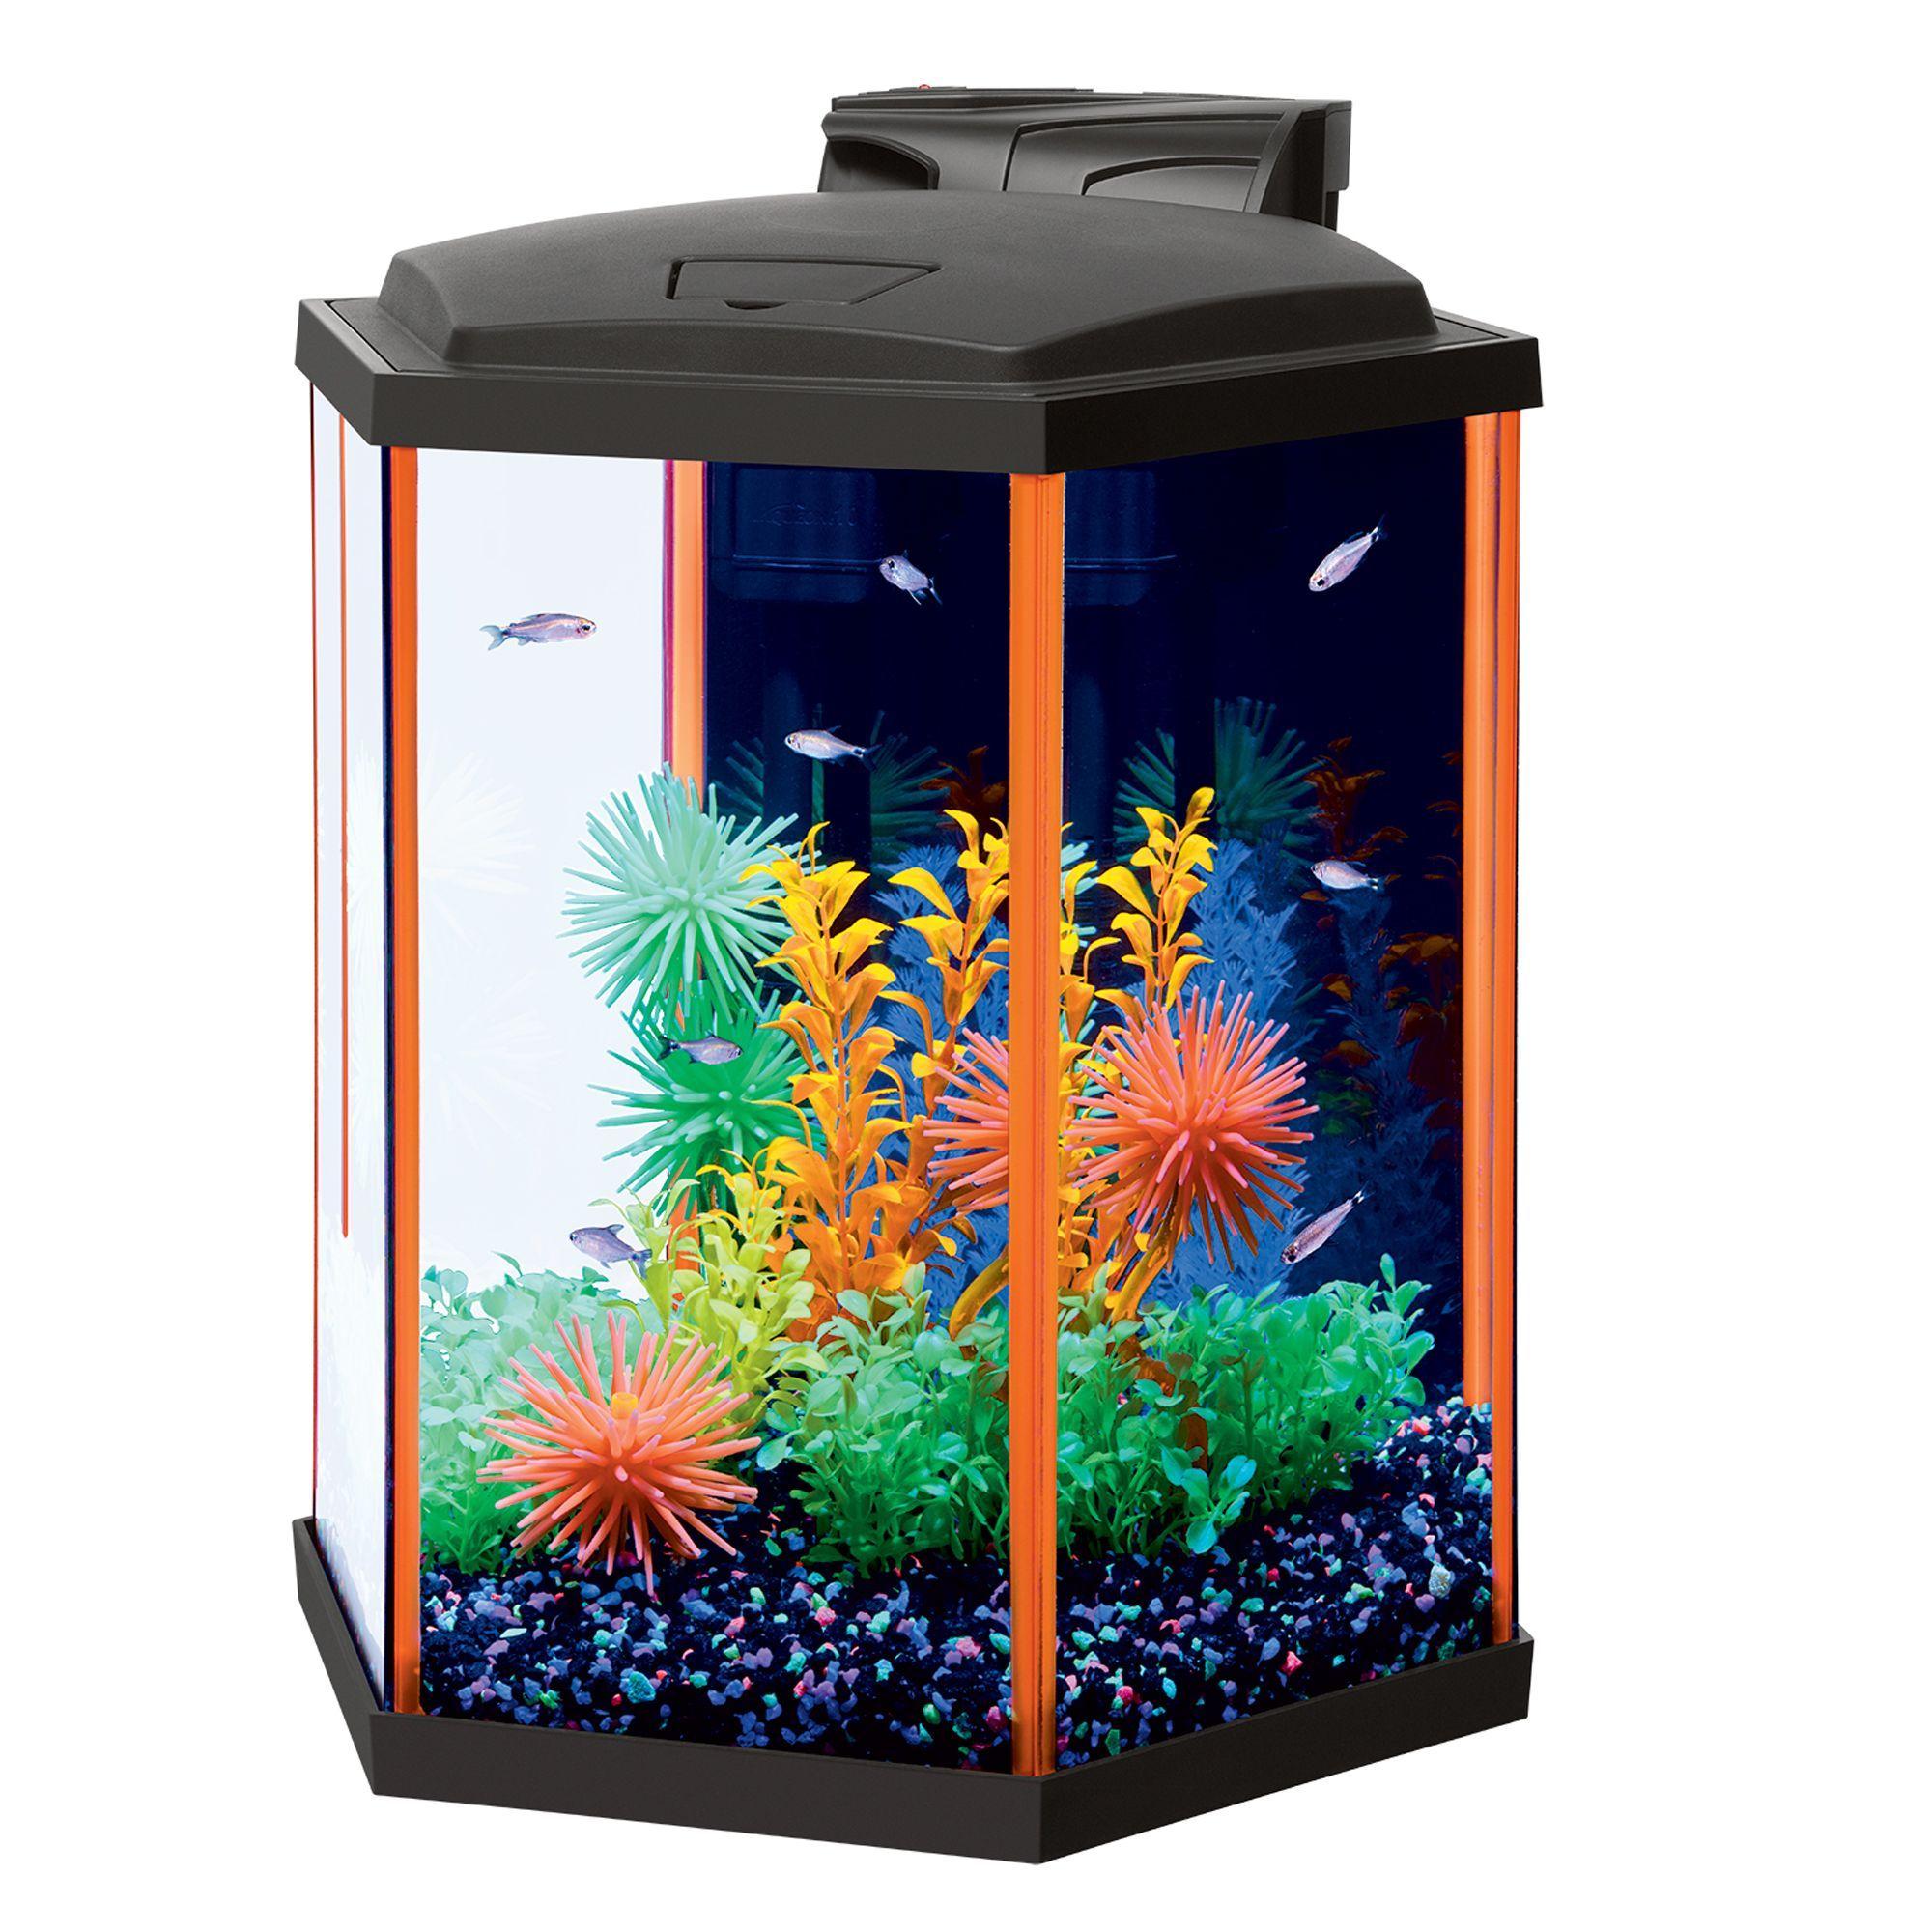 Aqueon Neo Glow Hexagon Starter Kit Size 8 Gal Black Blue Gravel Aquarium Kit Betta Fish Betta Fish Tank